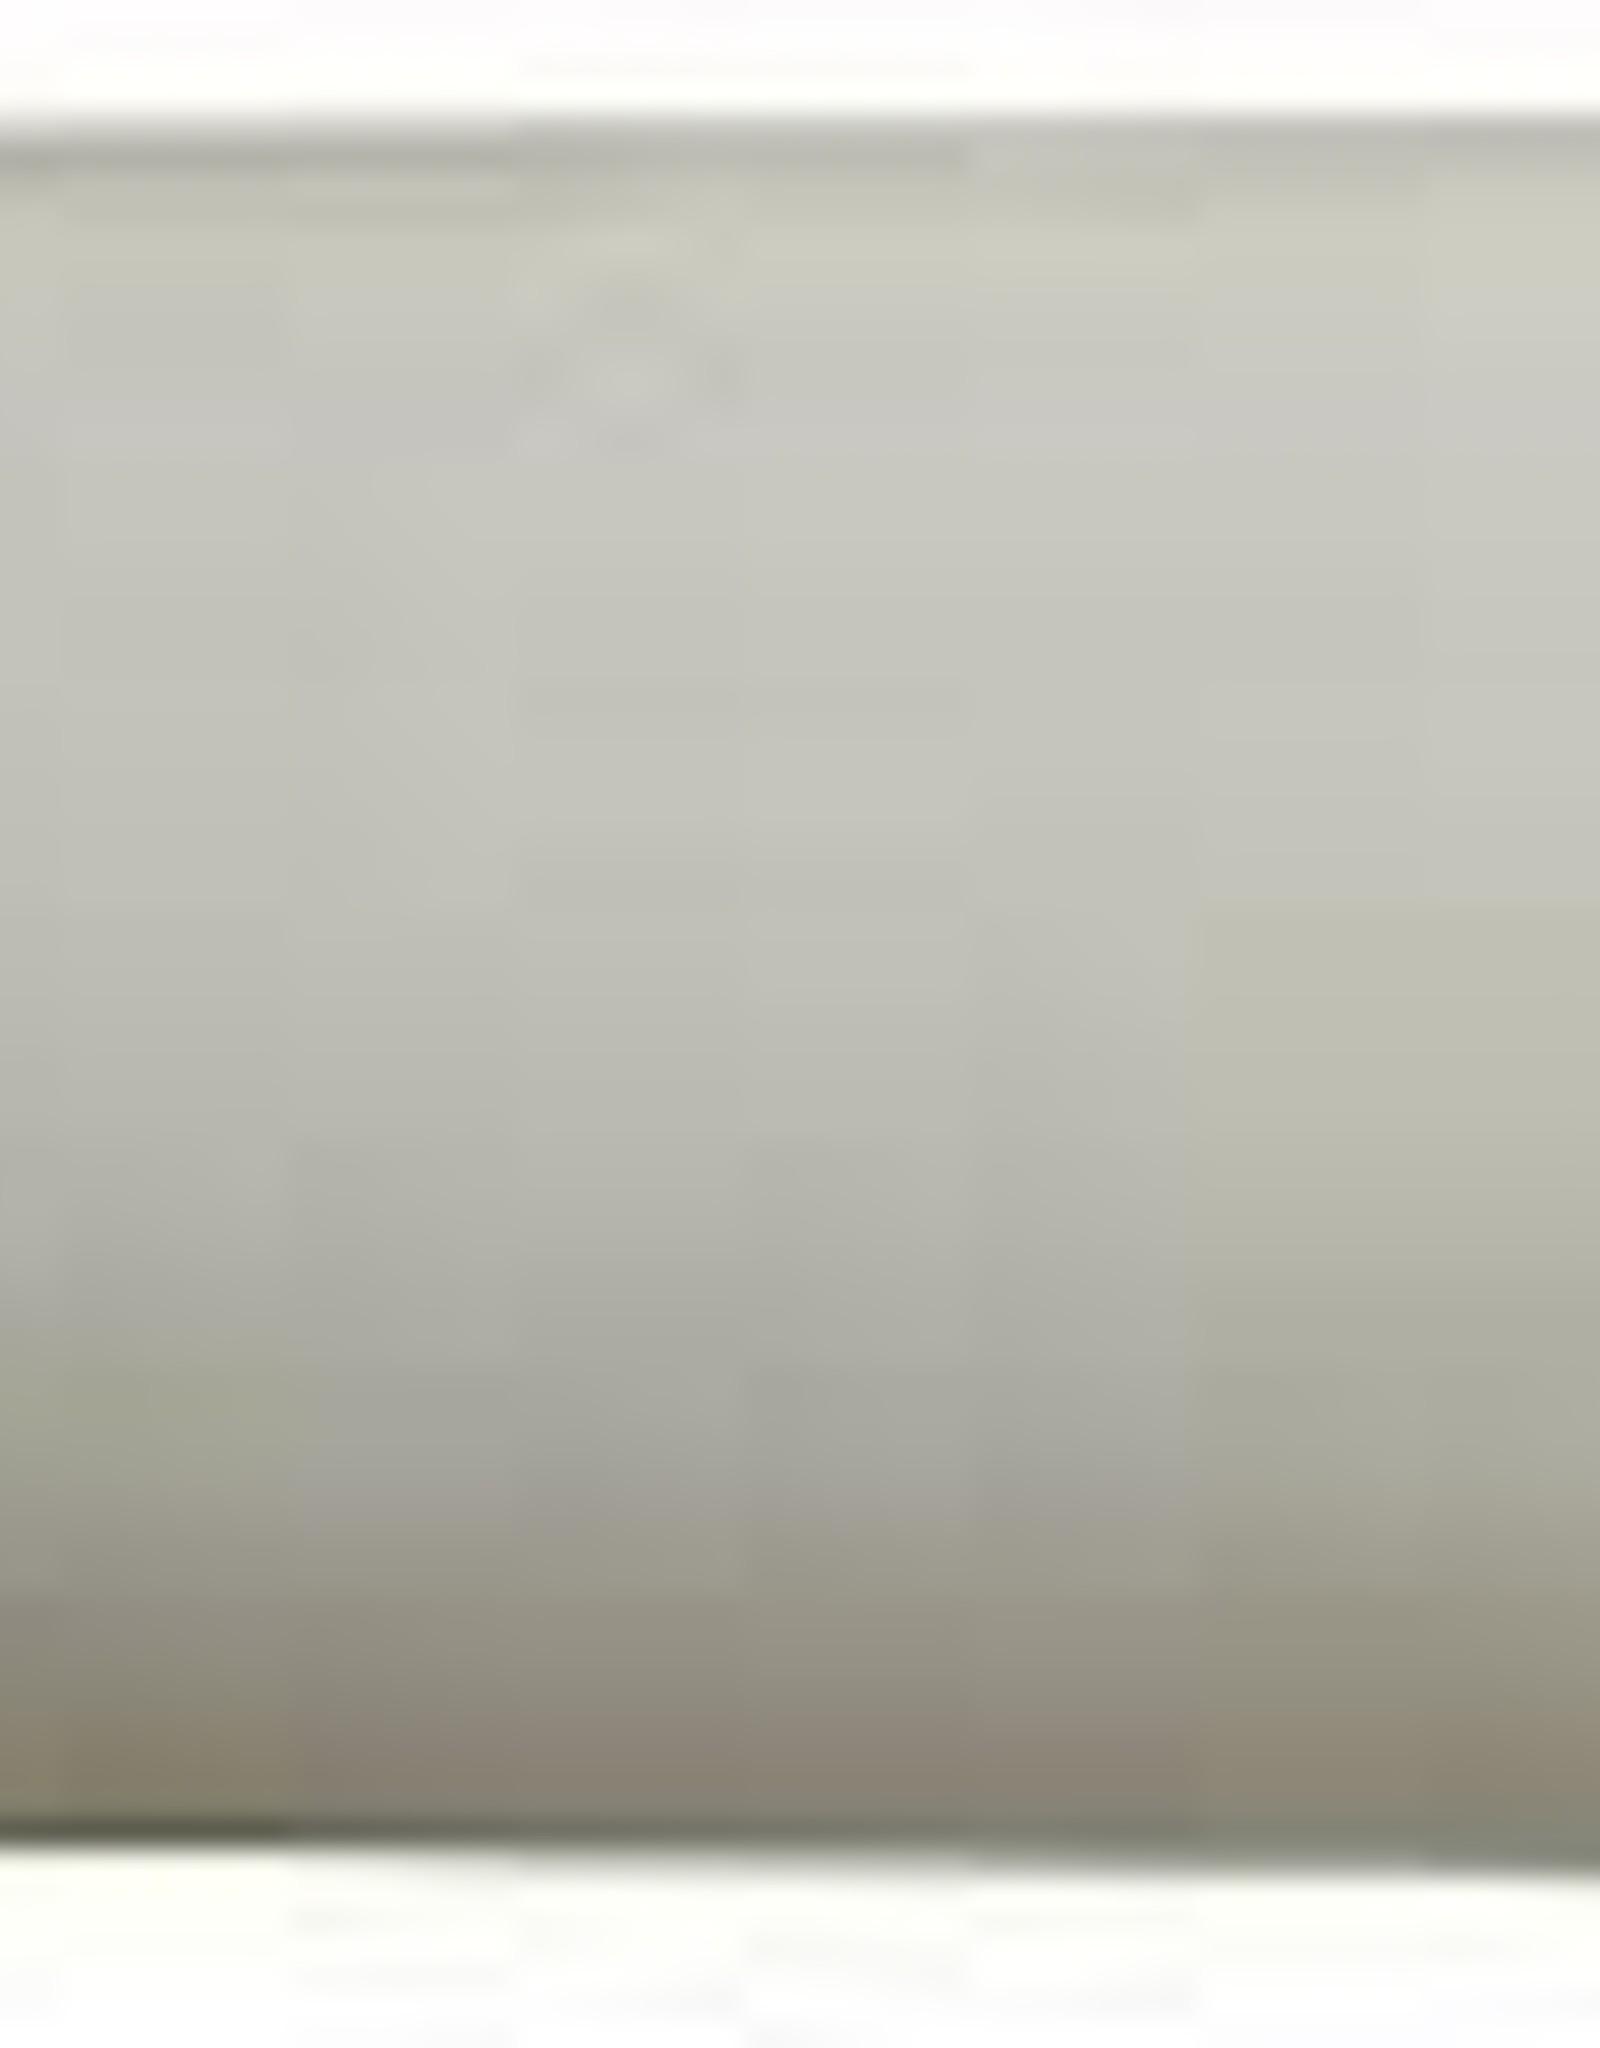 "2"" x 10' Length Sch40 PVC Pipe"